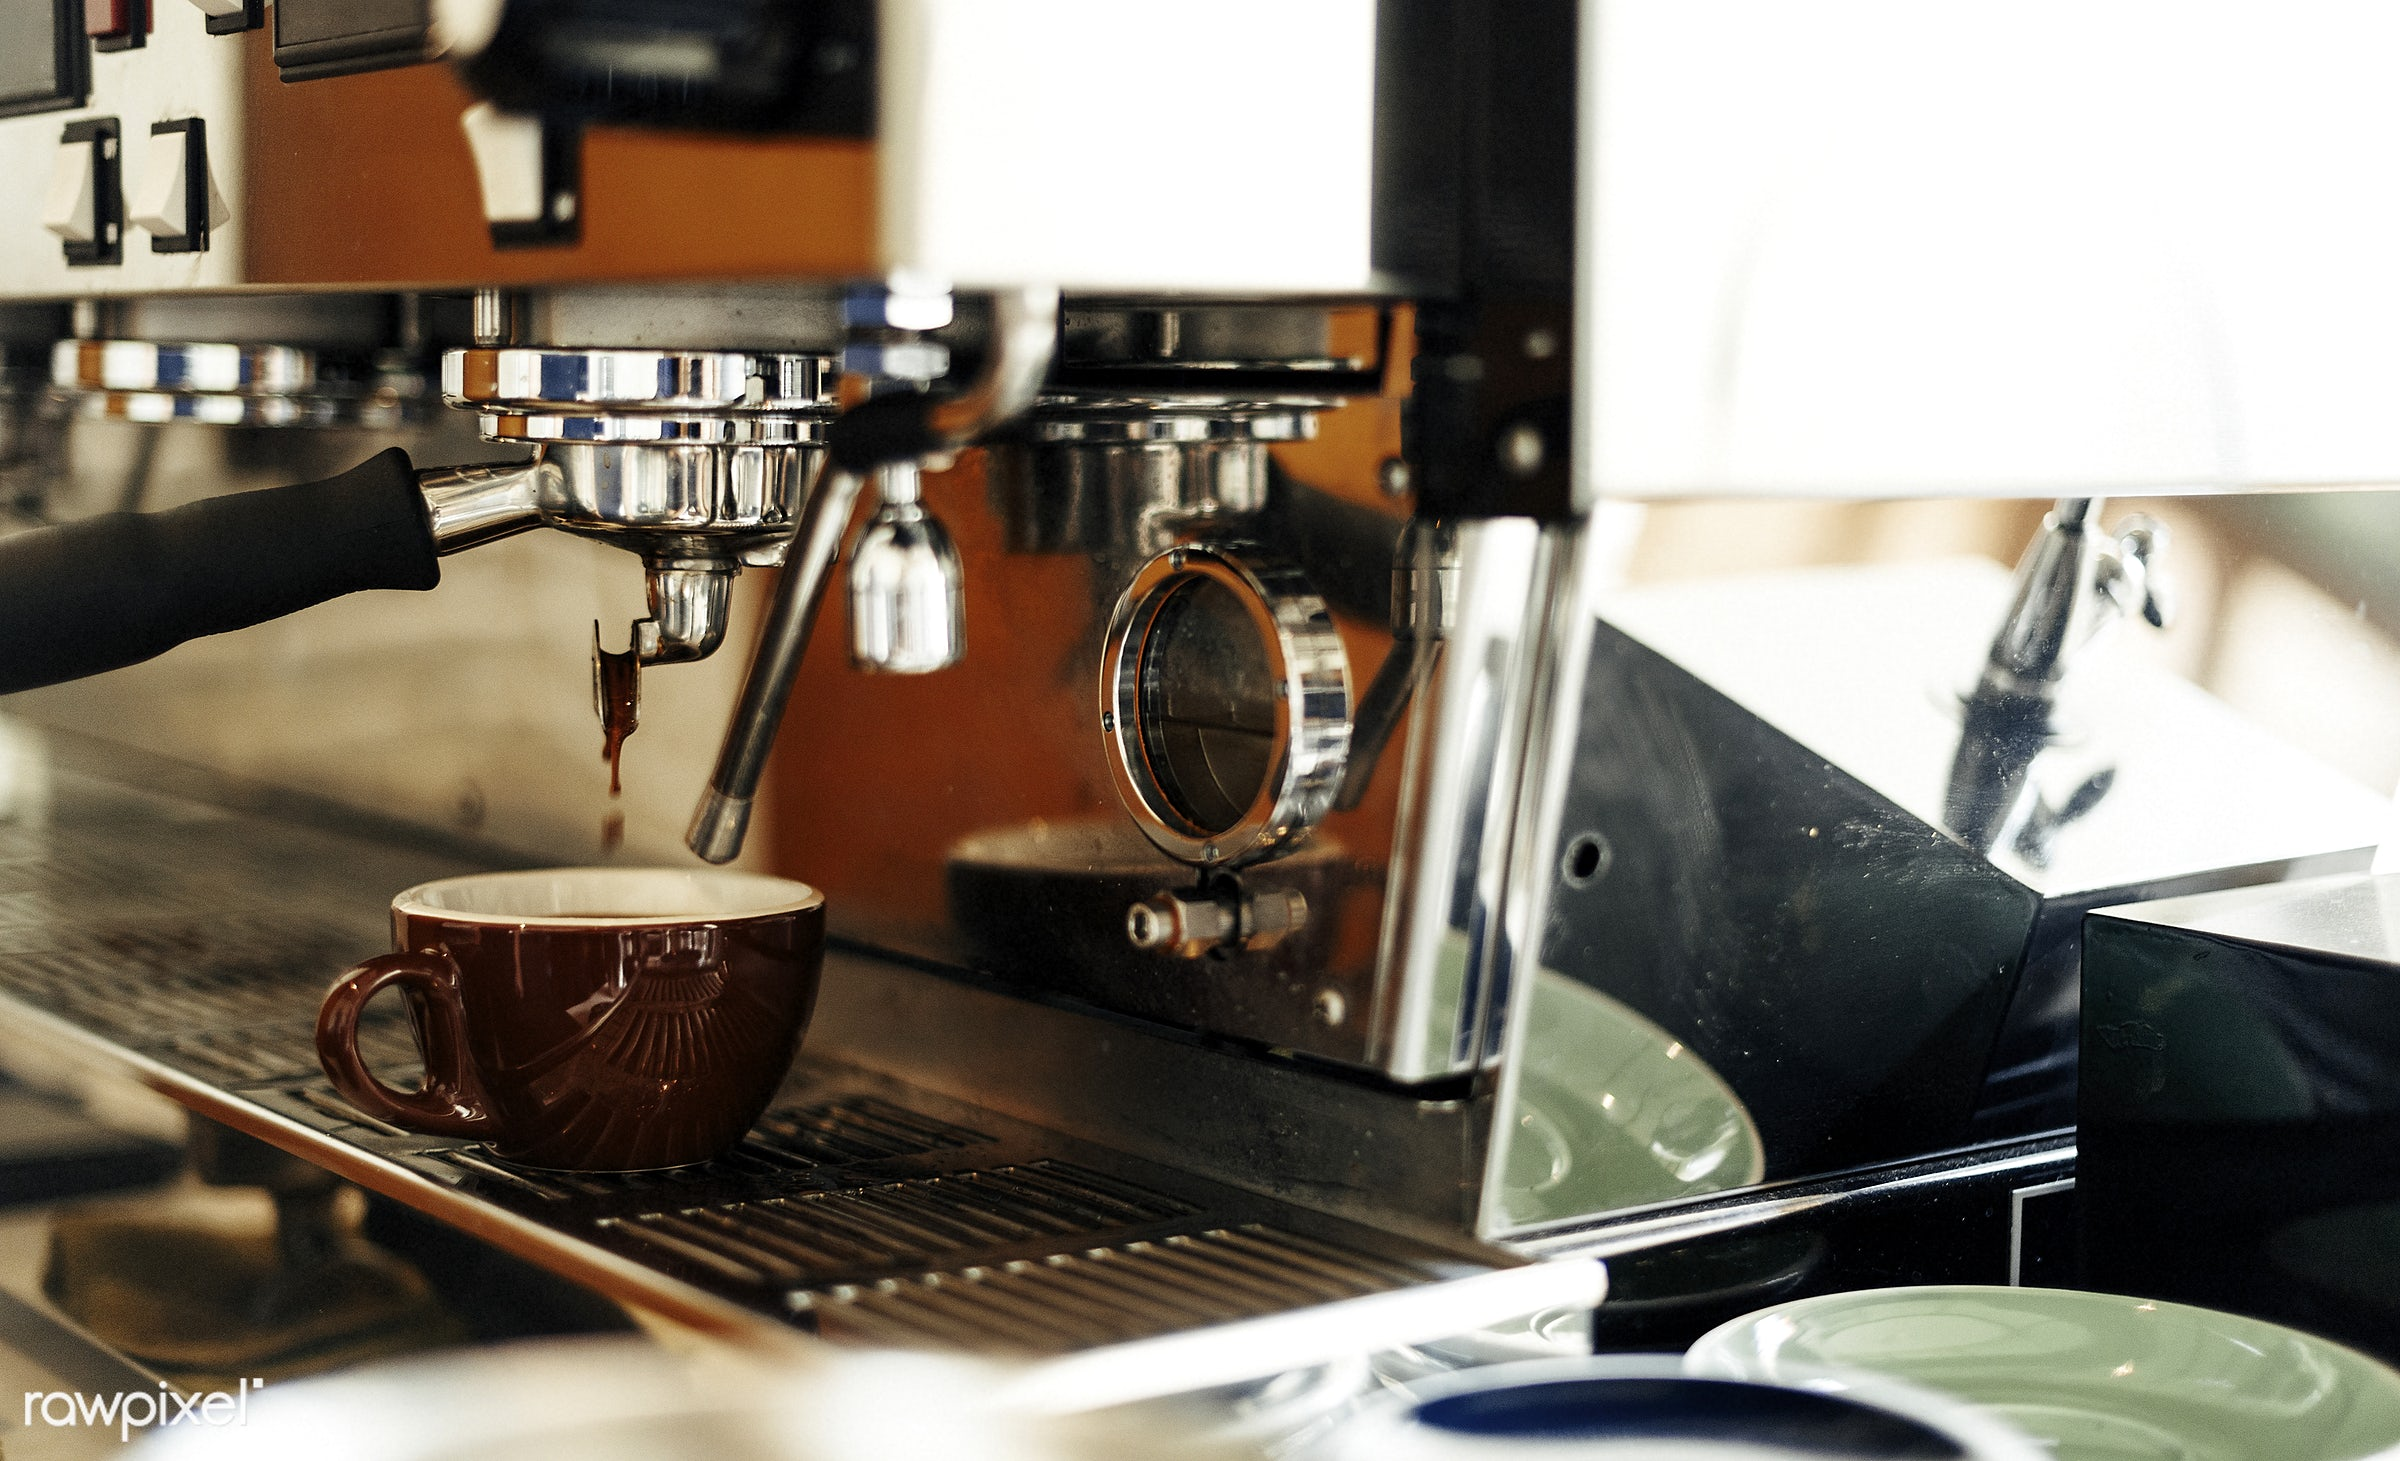 coffee machine, coffee, awakening, barista, beverage, break, business, cafe, caffeine, chill, coffee filter, coffee maker,...